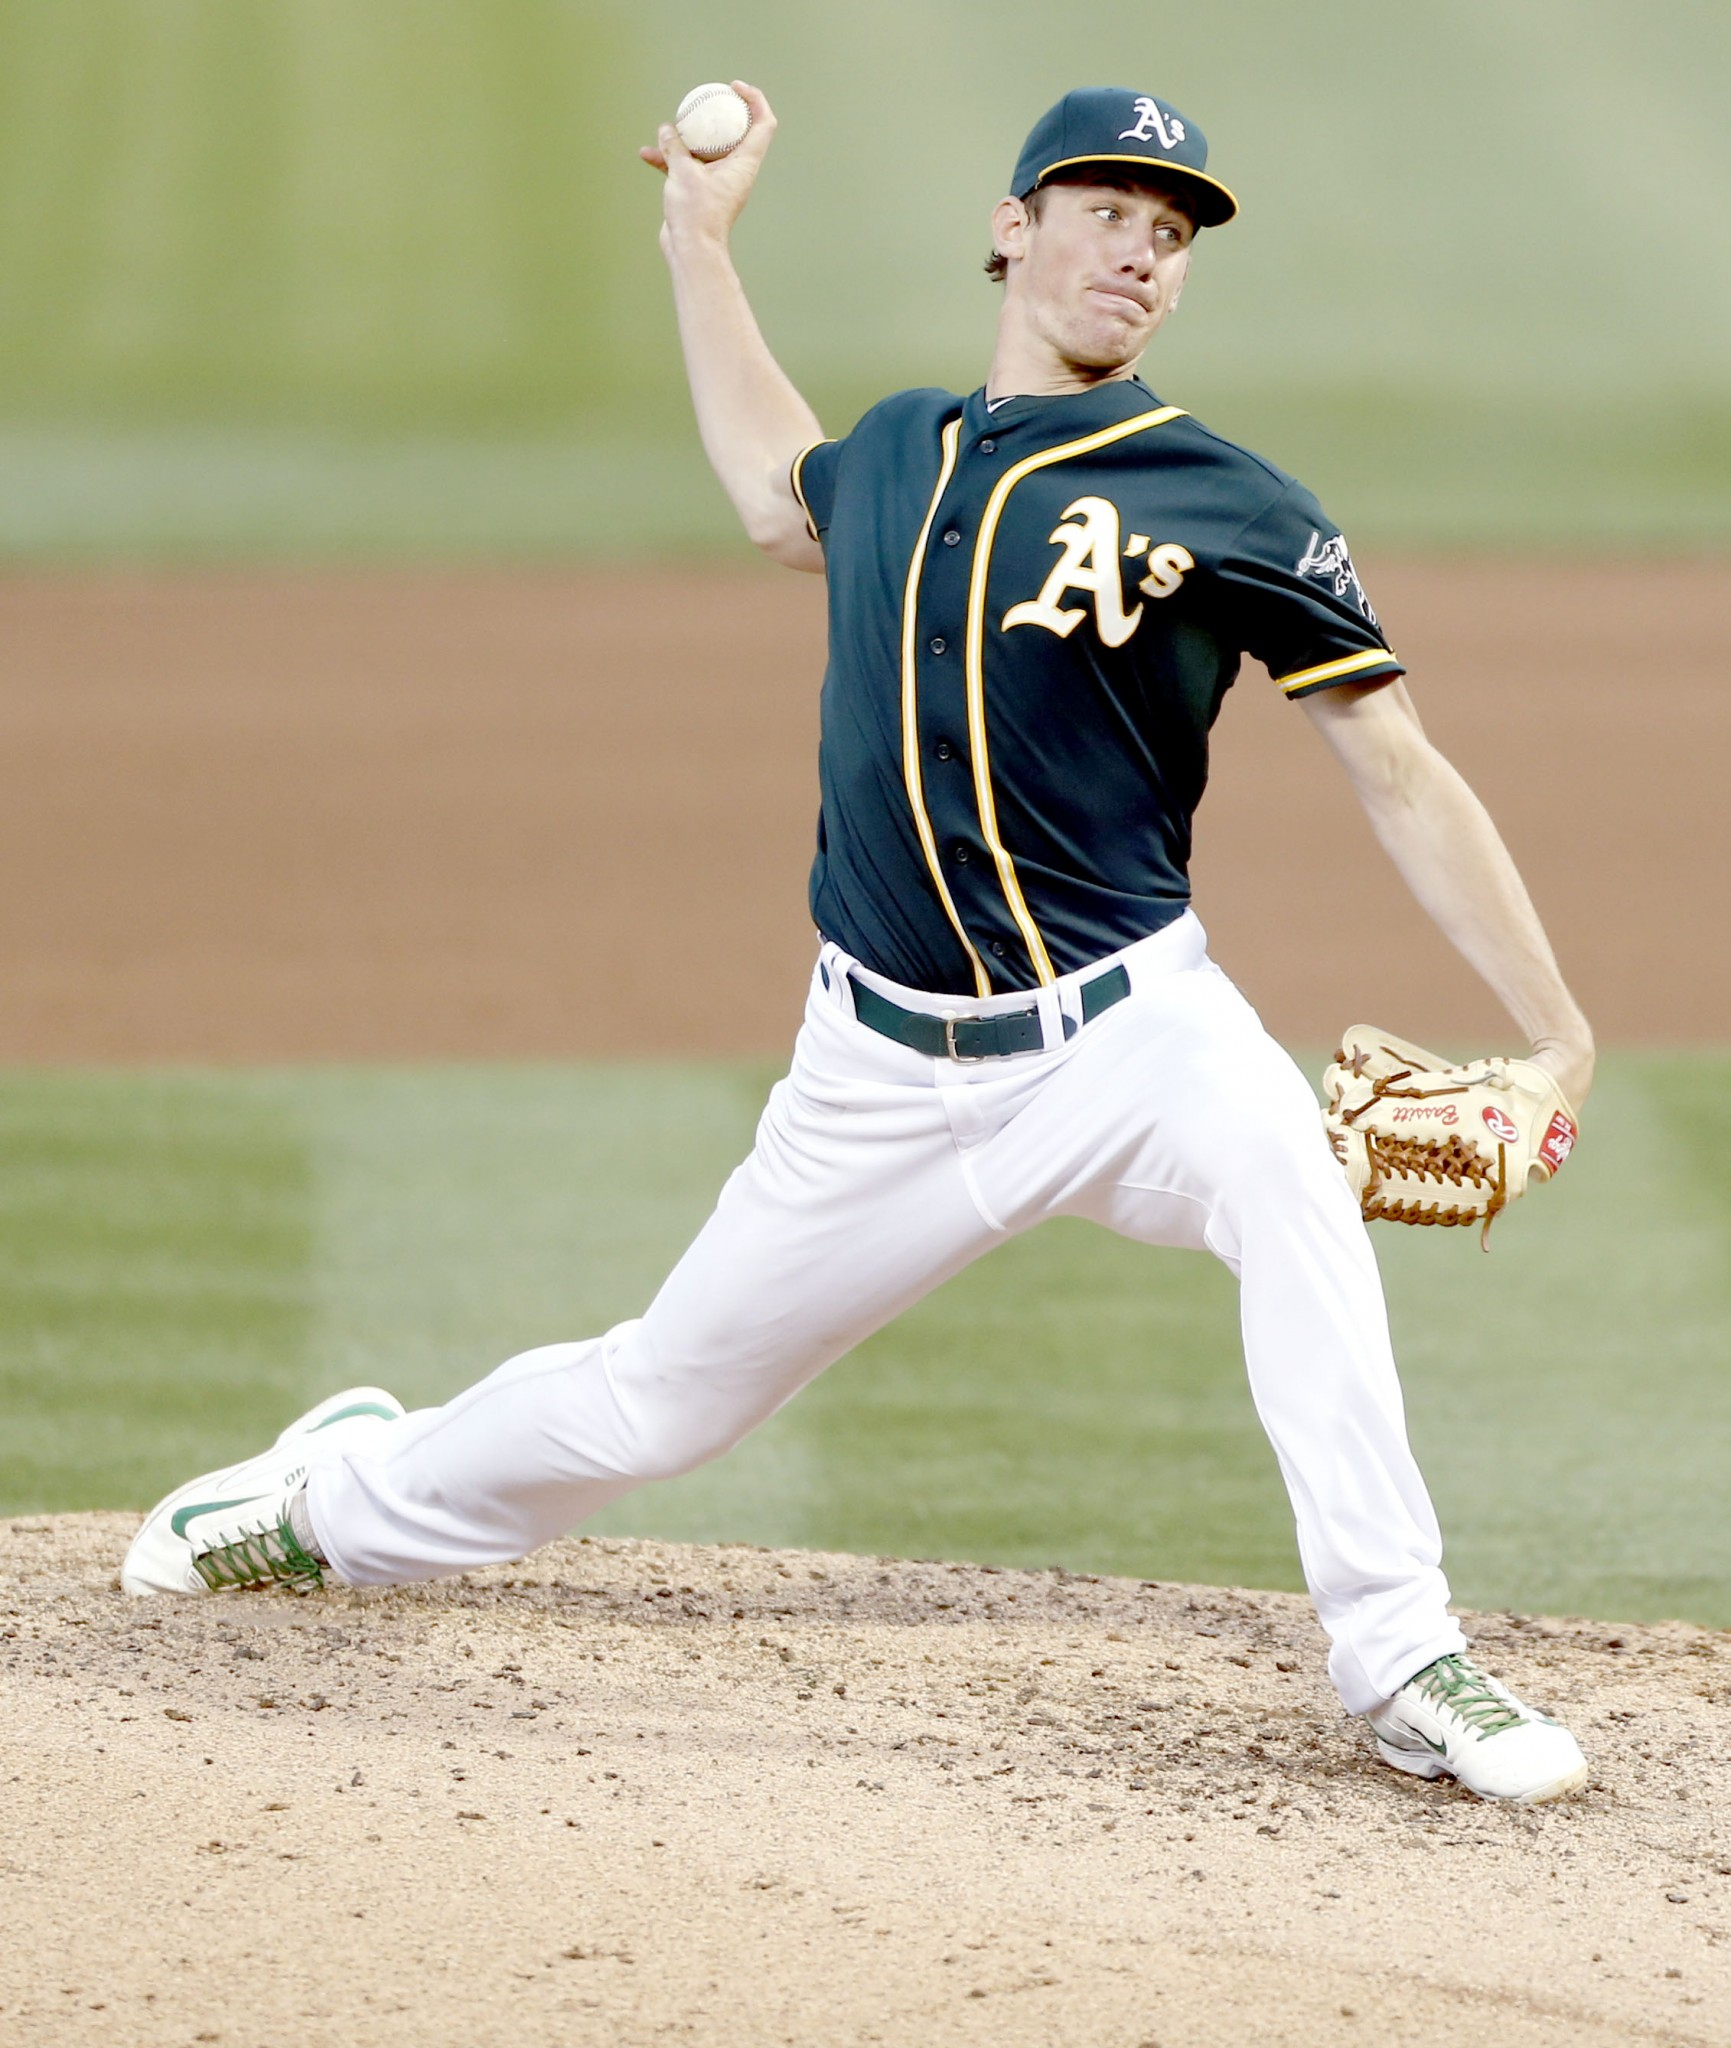 Oakland Athletics starting pitcher Chris Bassitt (Genoa/University of Akron). (Photo courtesy Oakland Athletics)